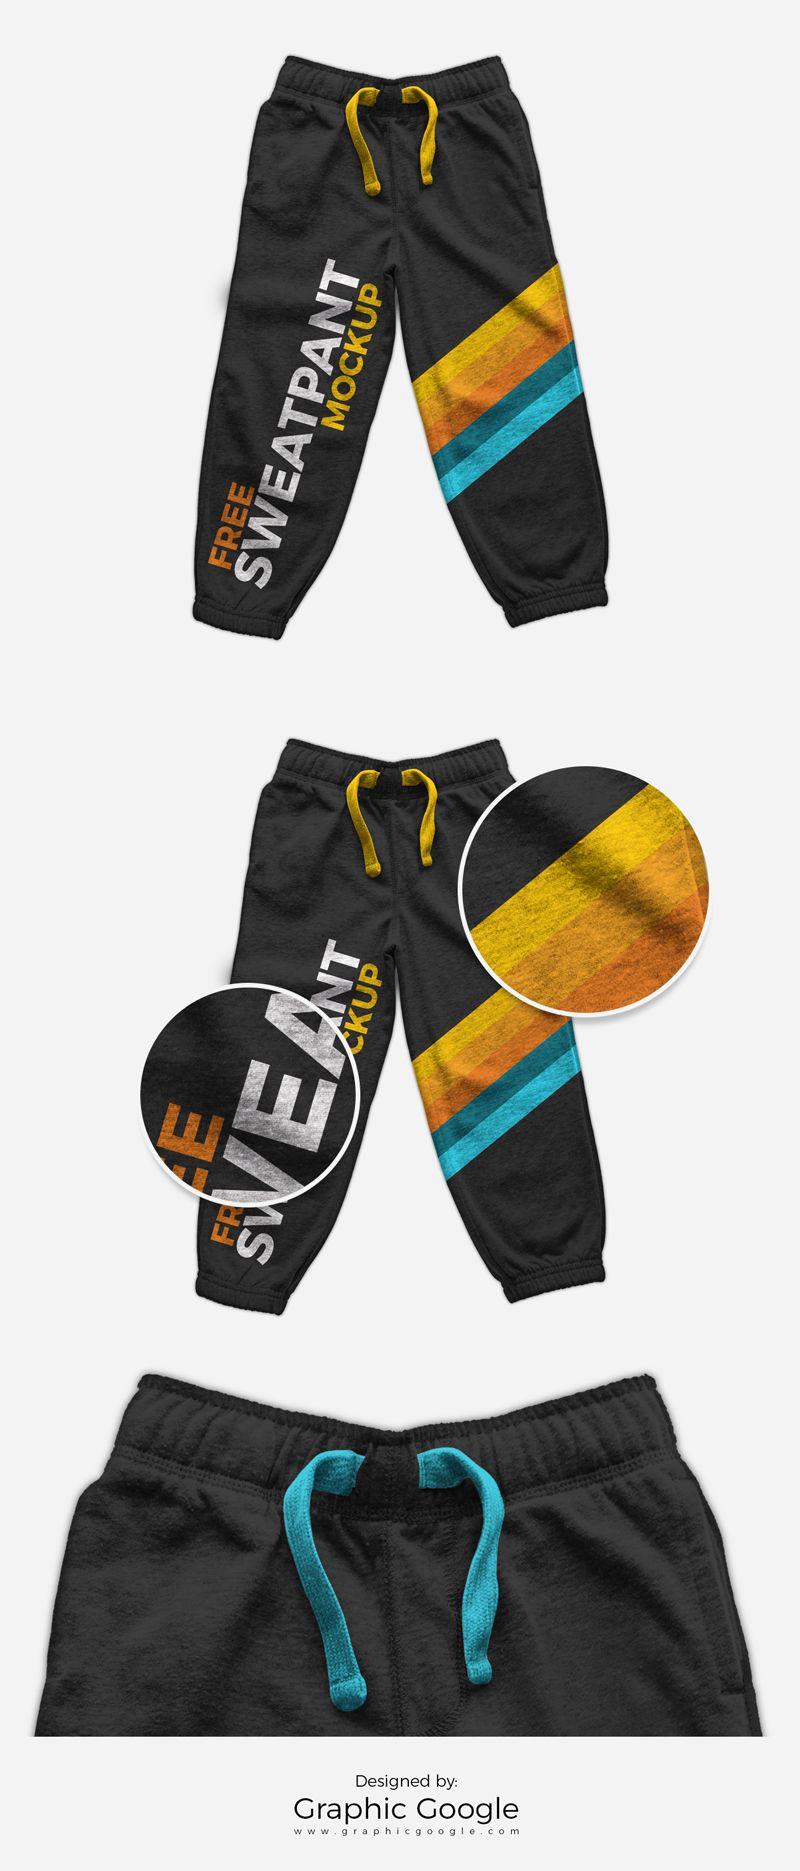 Download Athletic Sweatpants Mockup Athletic Sweatpants Mockup Psd Fashion Sweatpants Mockup Athletic Sweatpants